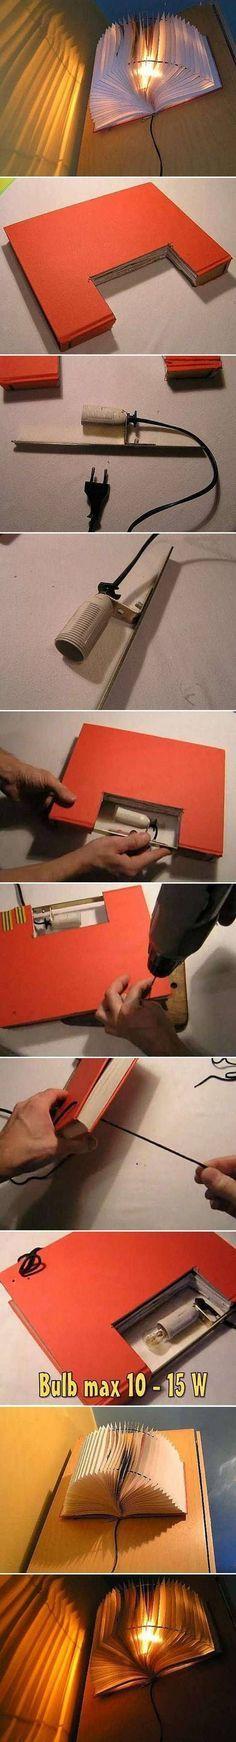 Diy Cool Lamp | DIY & Crafts Tutorials